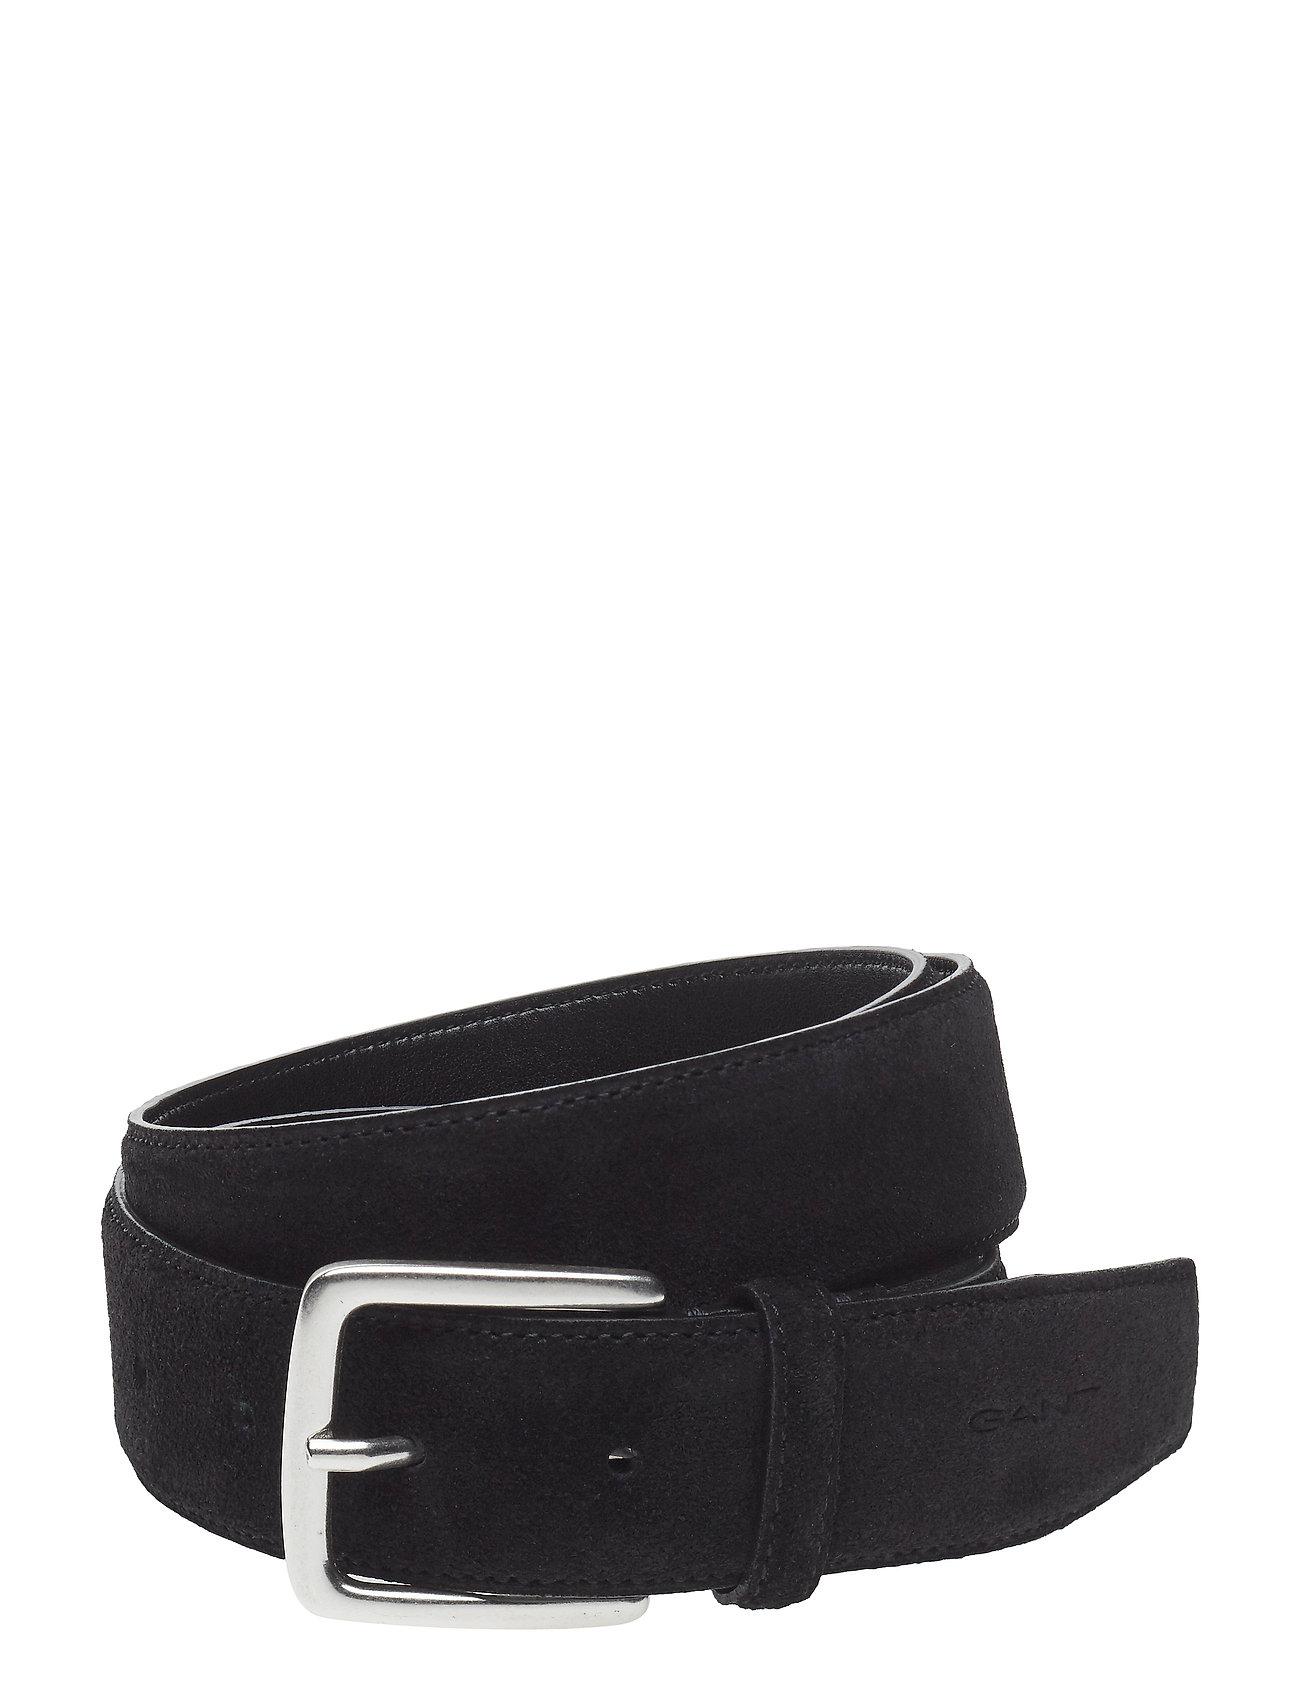 Image of Classic Suede Belt Accessories Belts Classic Belts Sort Gant (3120072541)